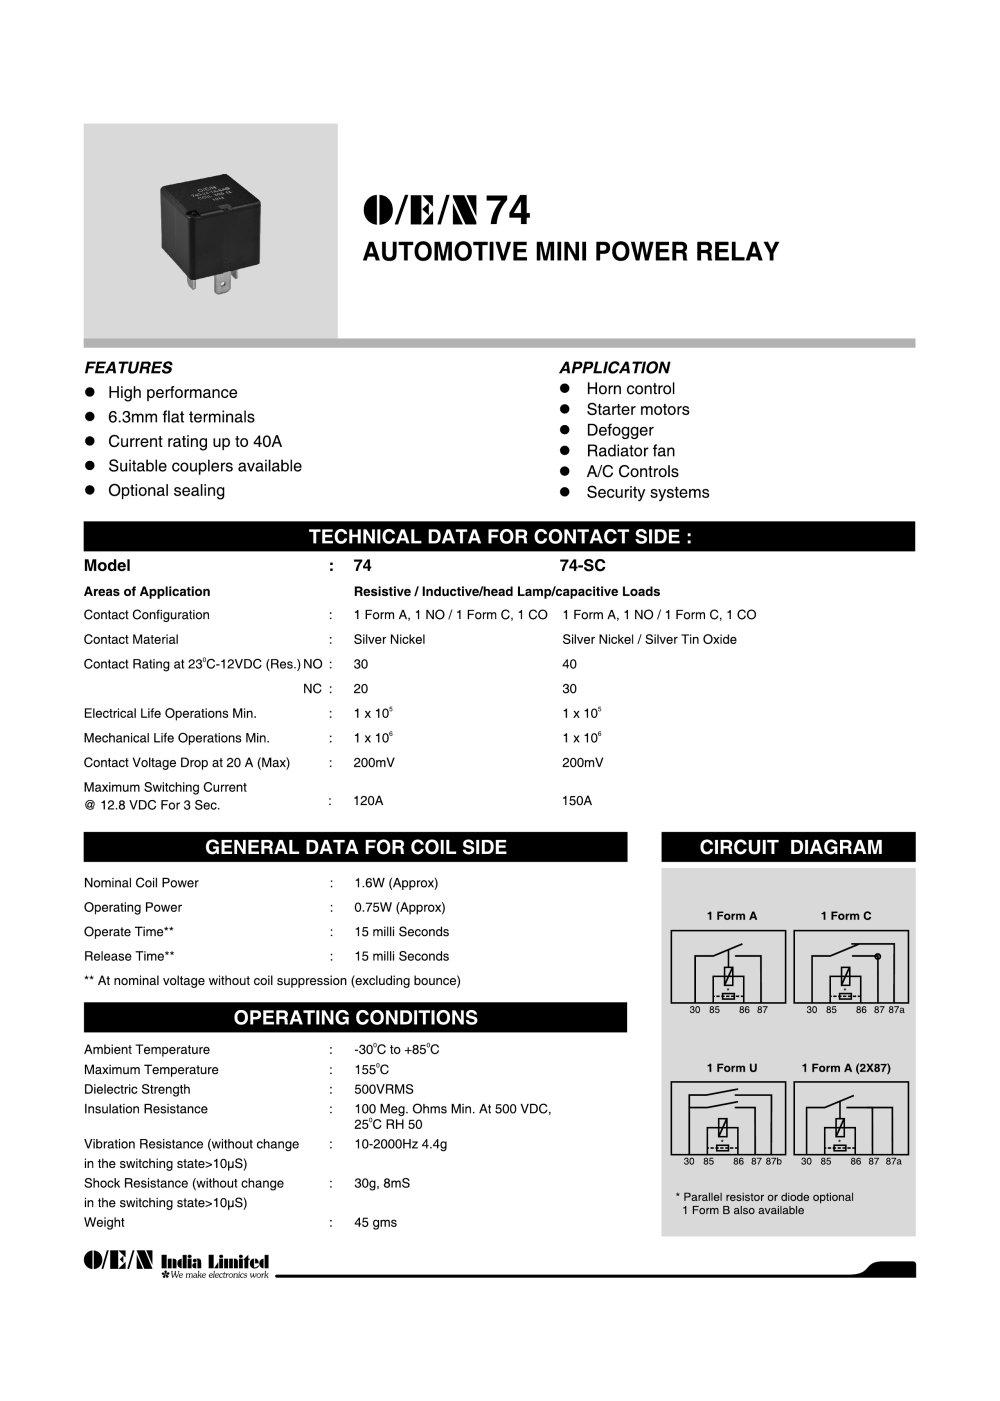 Automotive Relay Diagram Pdf Wiring Portal 12 Volt Series 74 O E N India Ltd Catalogue Rh Directindustry Com 30 Amp Diagrams